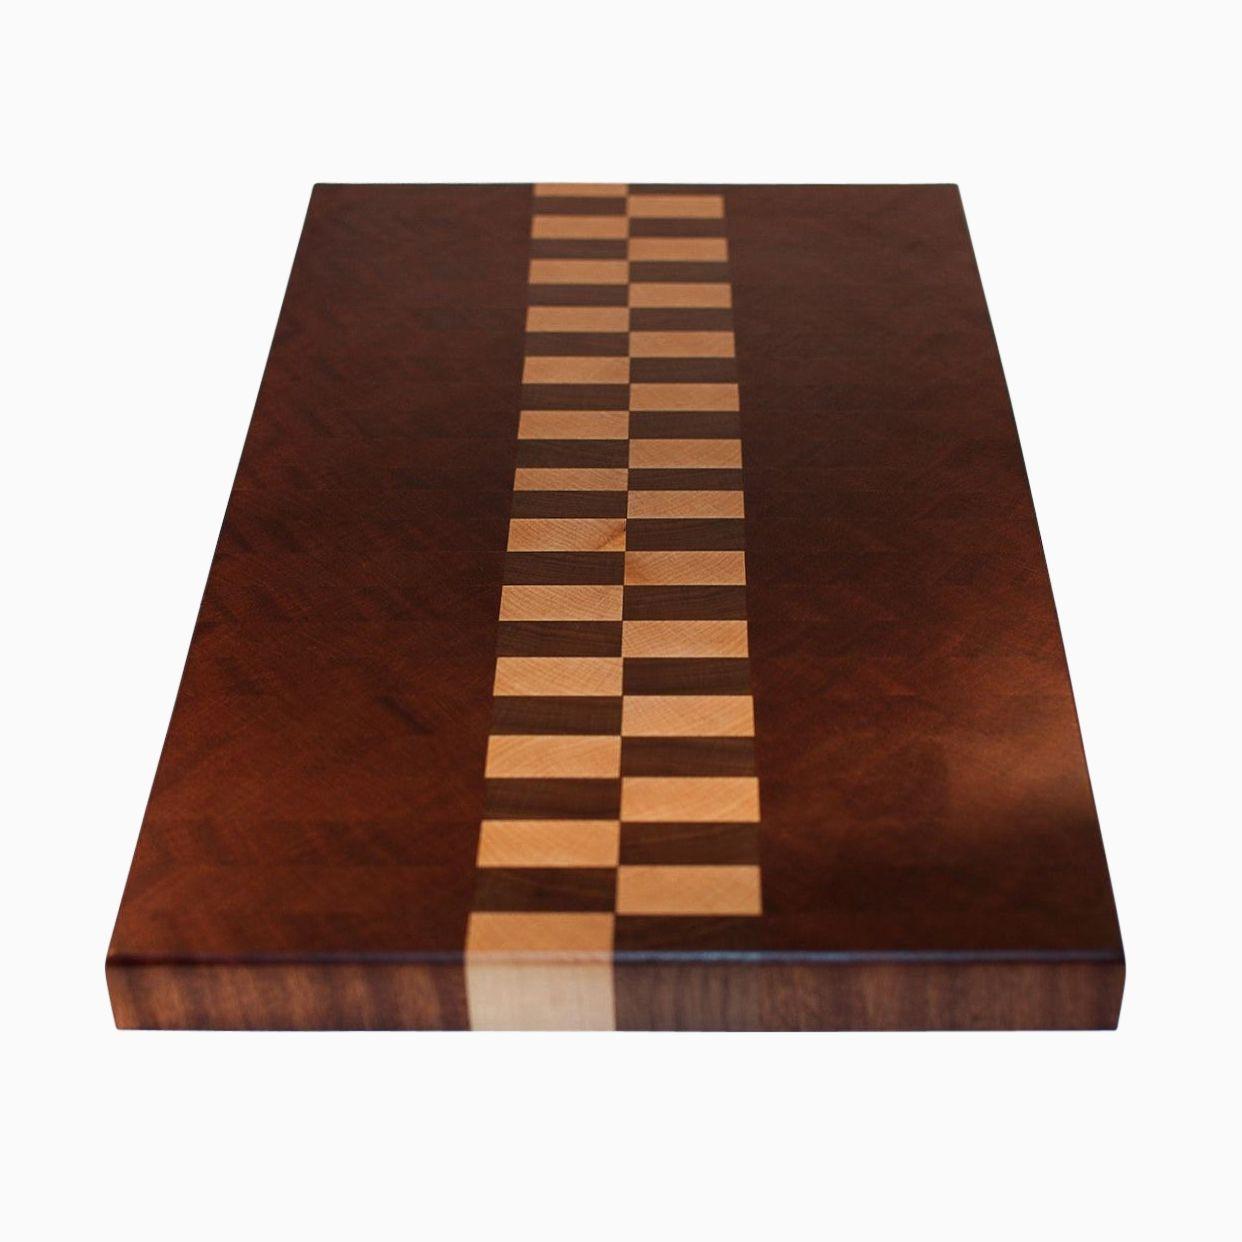 Cutting Board: Hand Made Mahogany And Walnut End Grain Cutting Board By